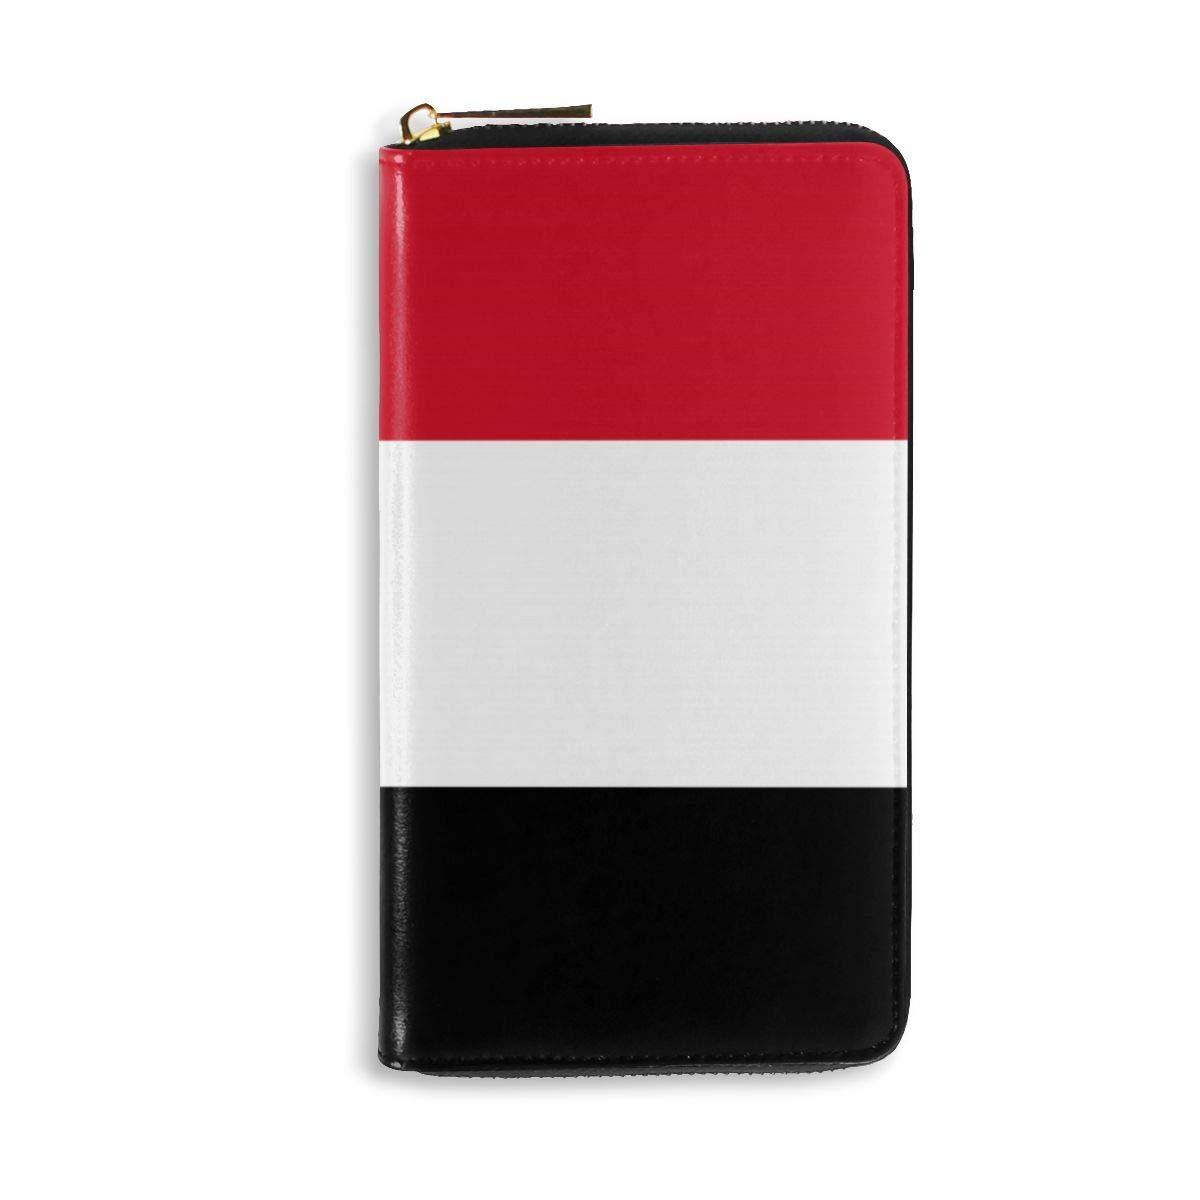 Caesar Melville Flag of Yemen Coin Purse Canvas Bags Leather Long Wallet Handbag